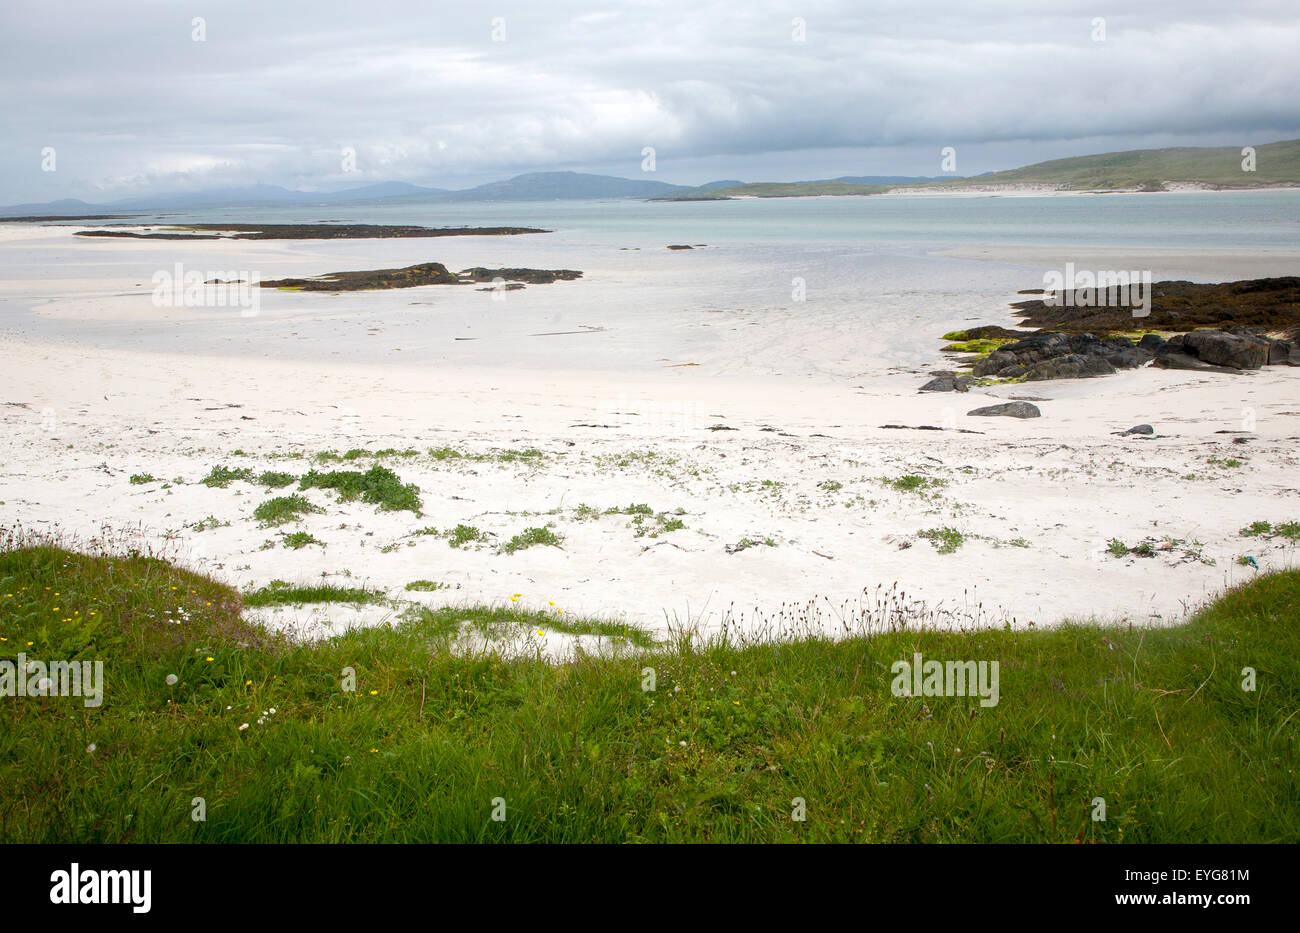 Overcast sky sandy beach Eoligarry, Barra, Outer Hebrides, Scotland, UK - Stock Image